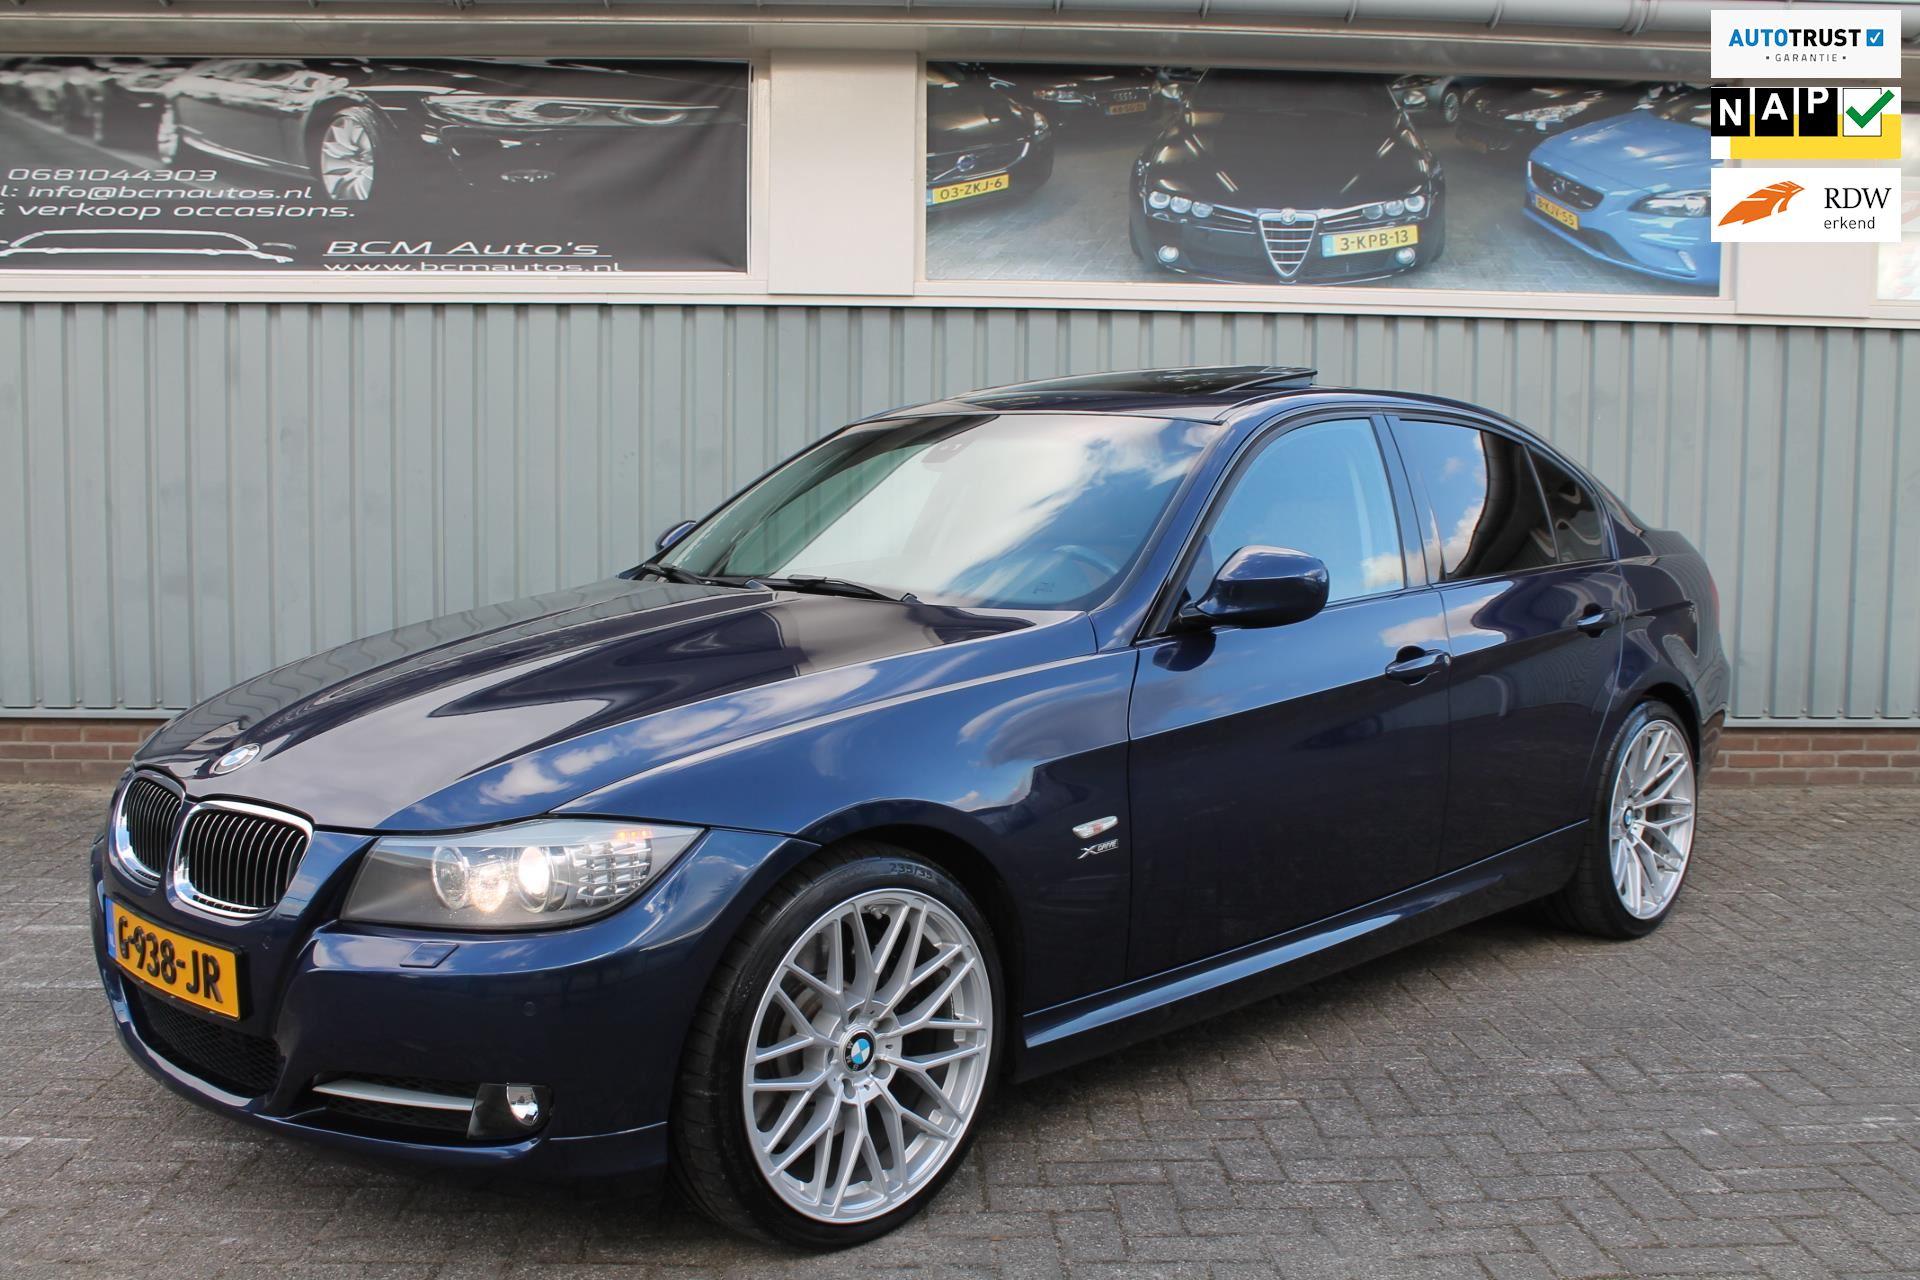 BMW 335Xi High Executive Automaat Leer Dakota bruin Glazen dak Navi 19 inch Volledige historie Harman Ka occasion - BCM Auto`s